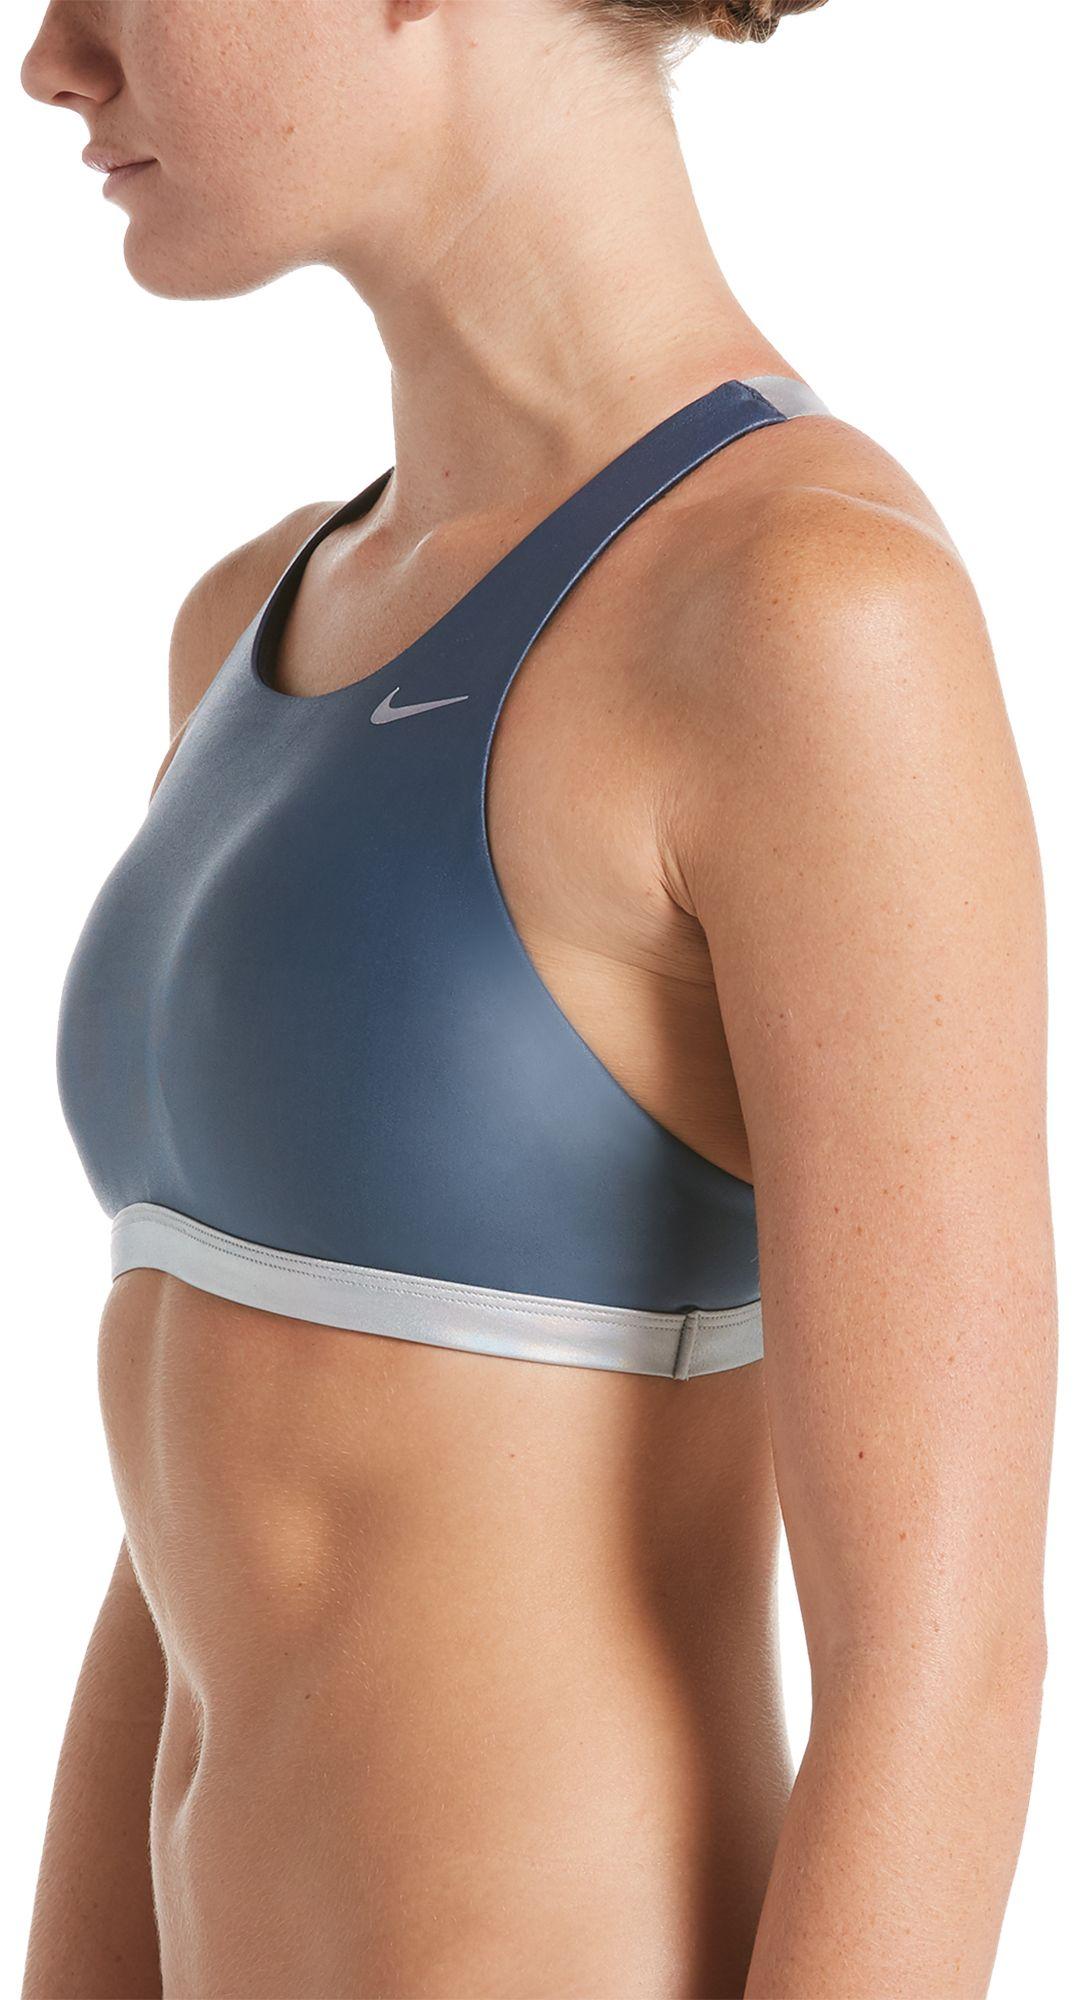 98a324e70054a Nike Women's Flash Bonded Fastback Bikini Top